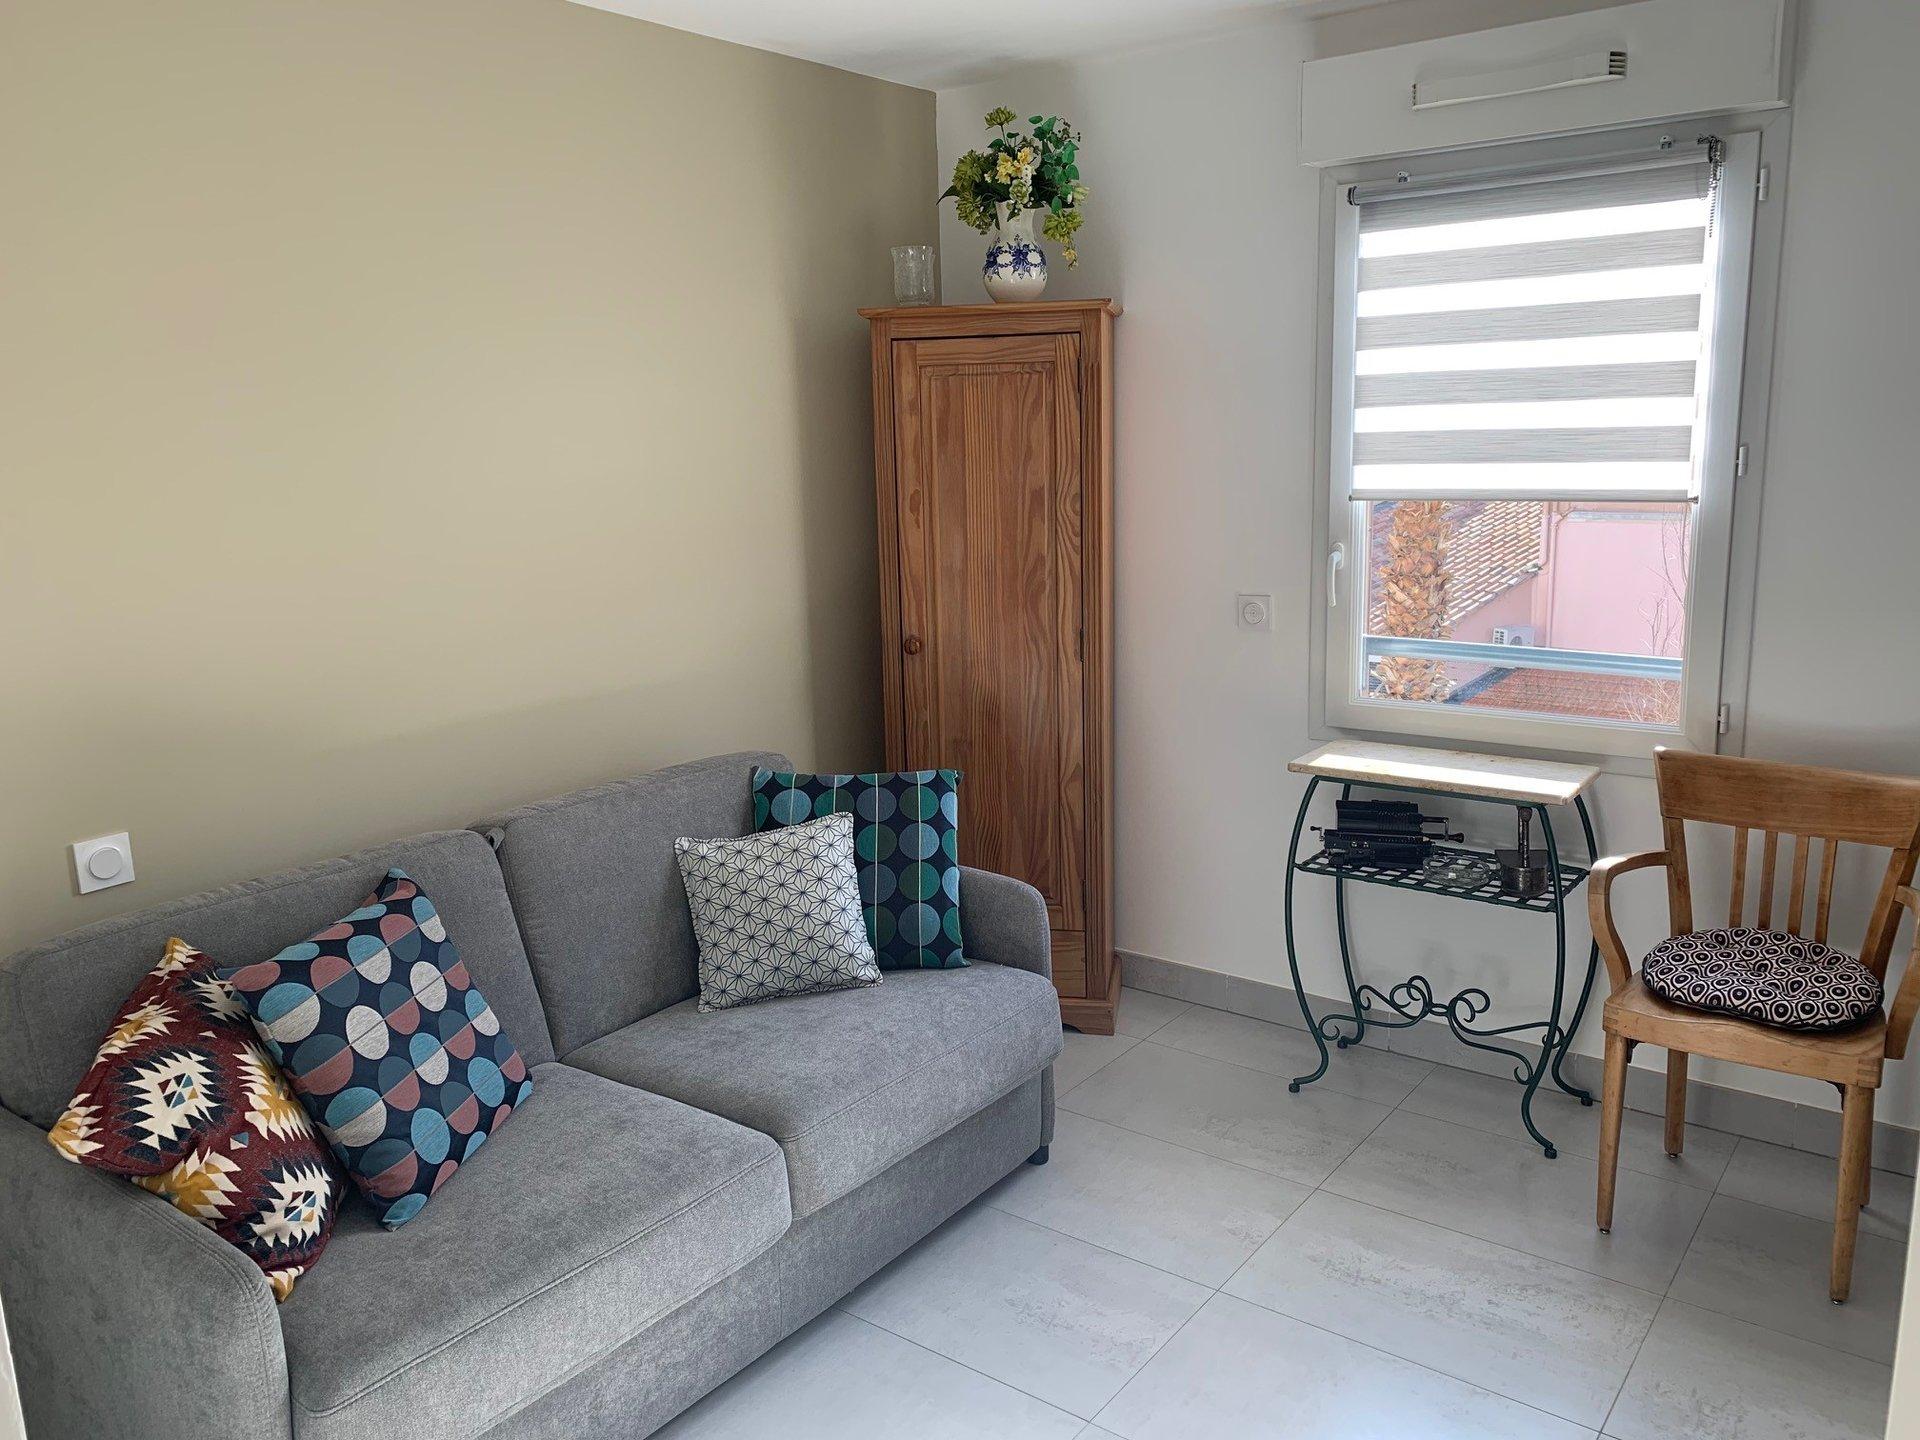 3-room apartment close to the harbor